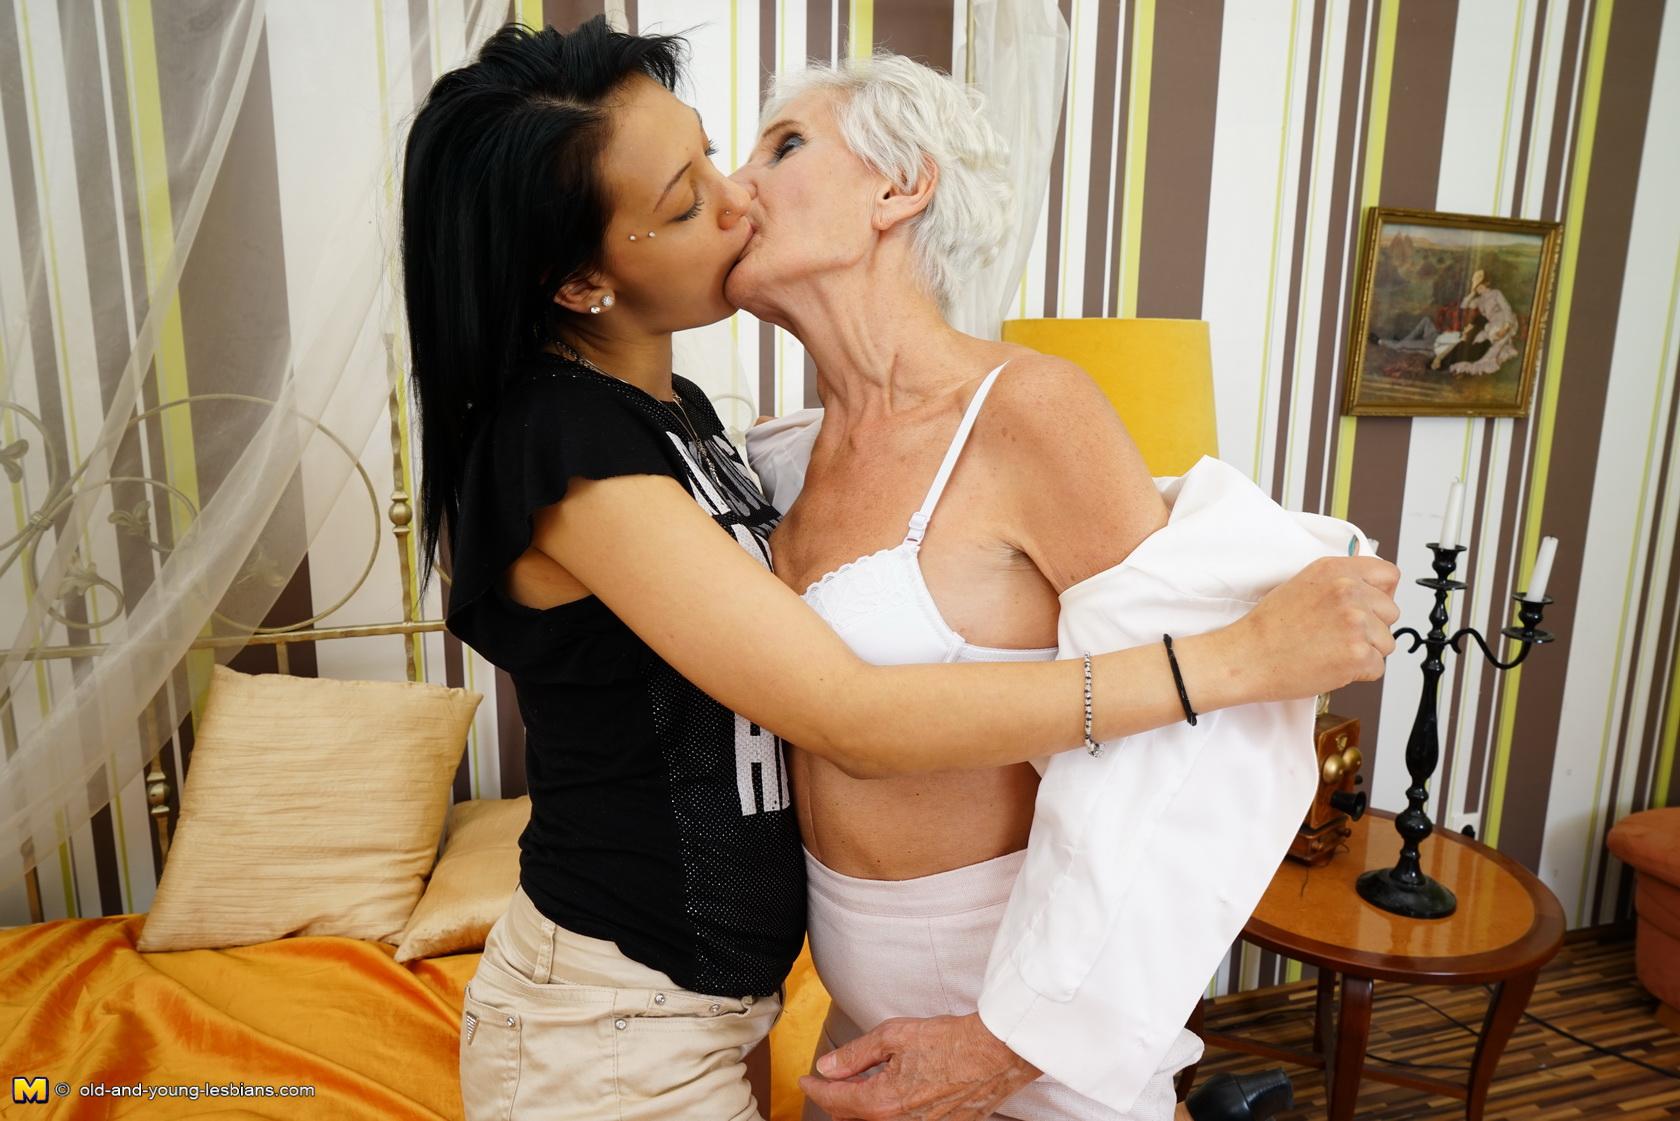 Lesbian Teen Making Out